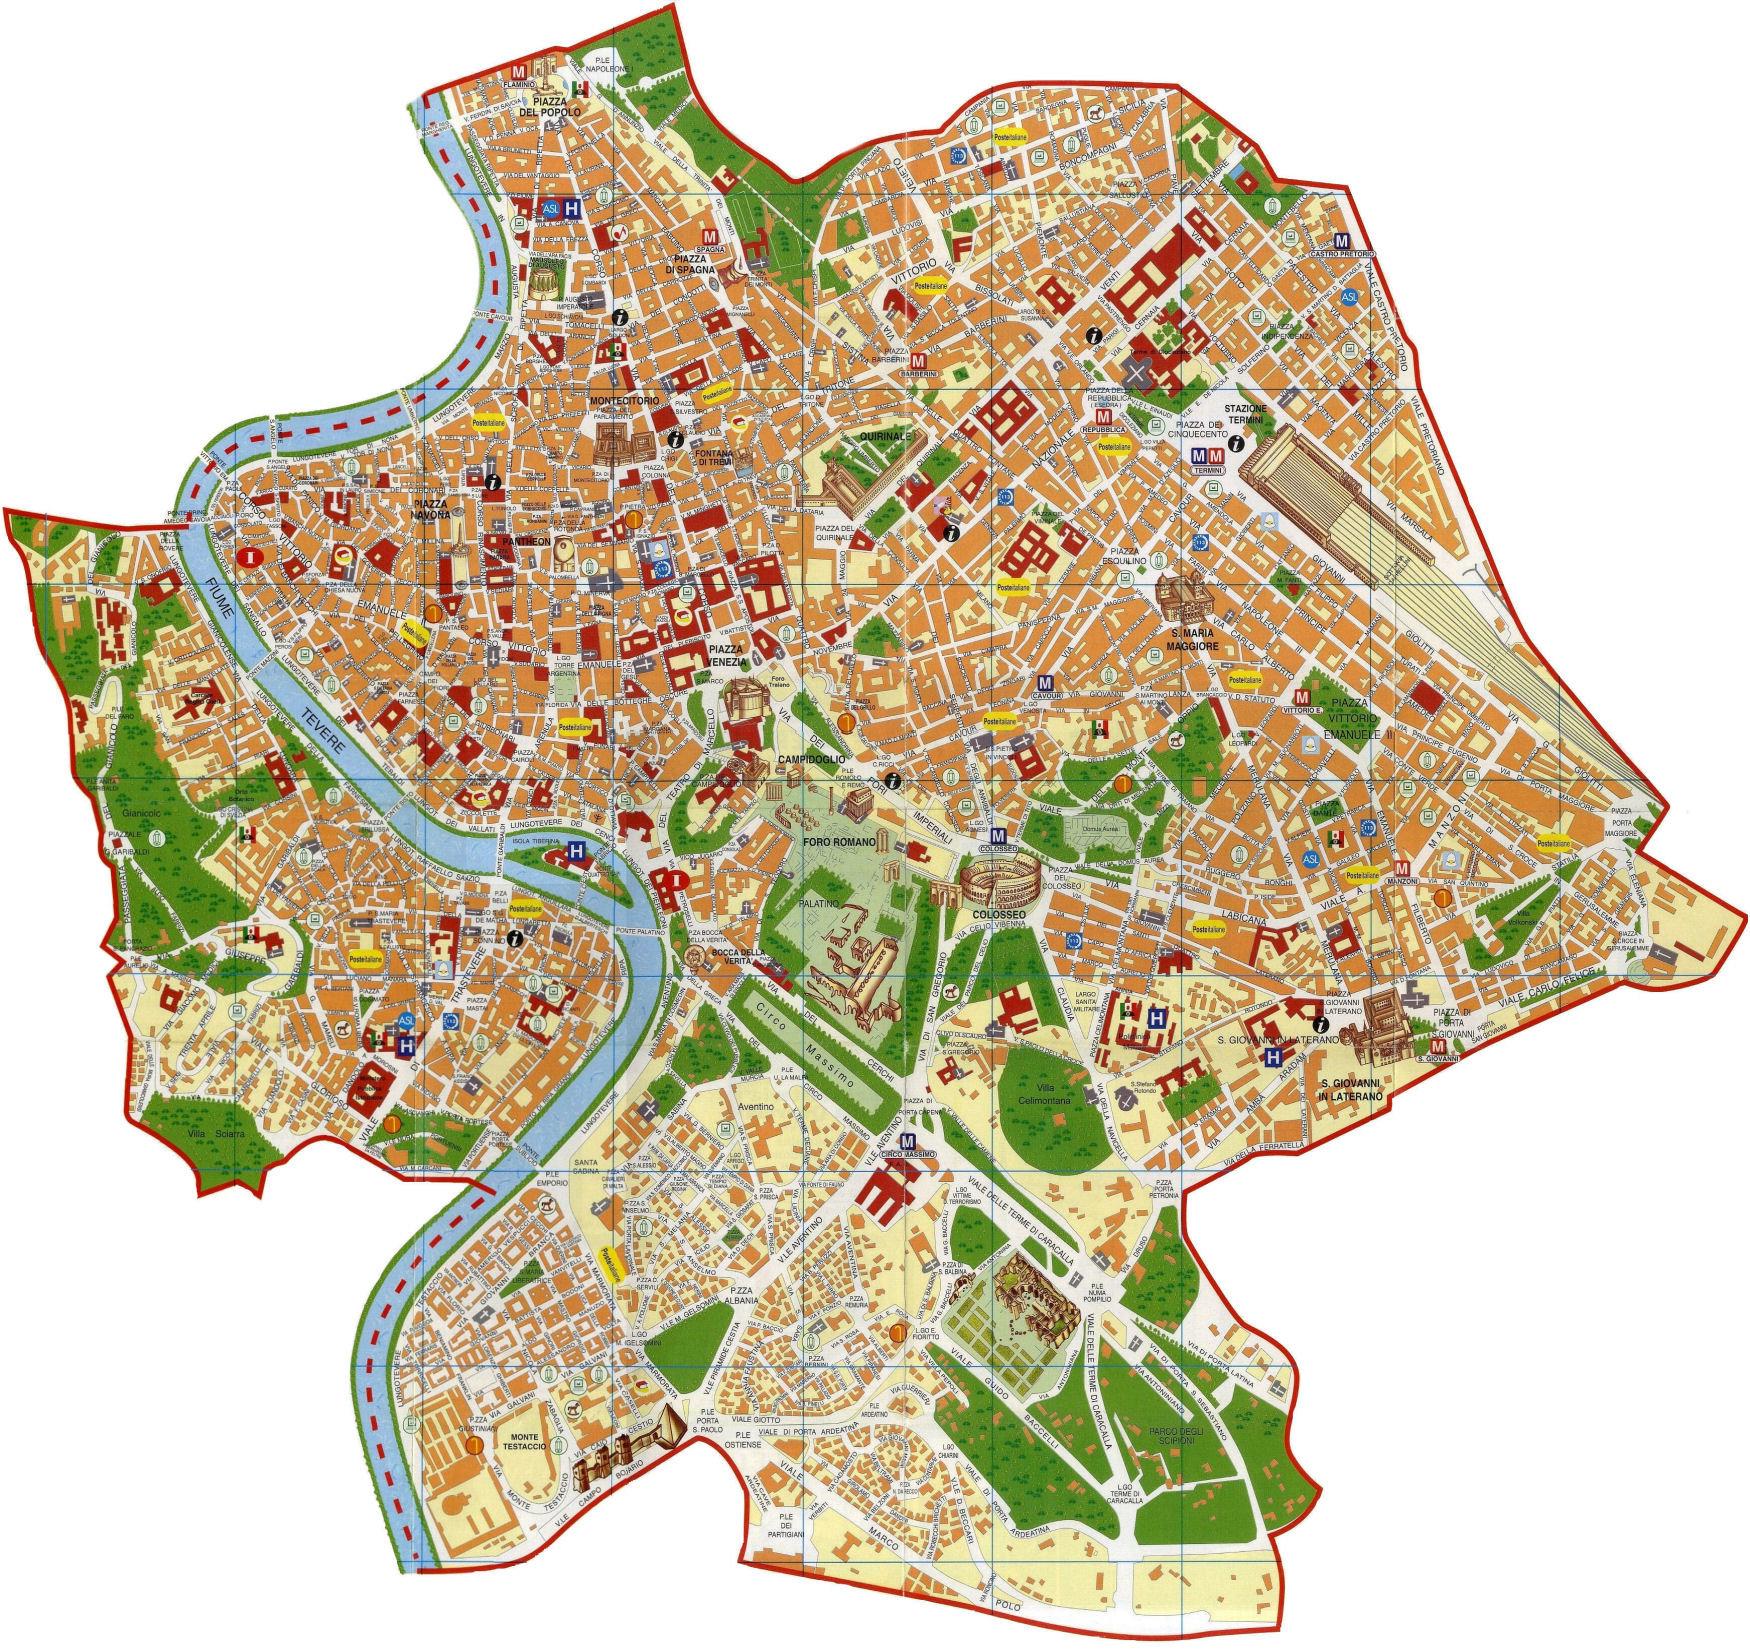 Cartina Roma Turistica.Mappa Roma Junglekey It Immagini